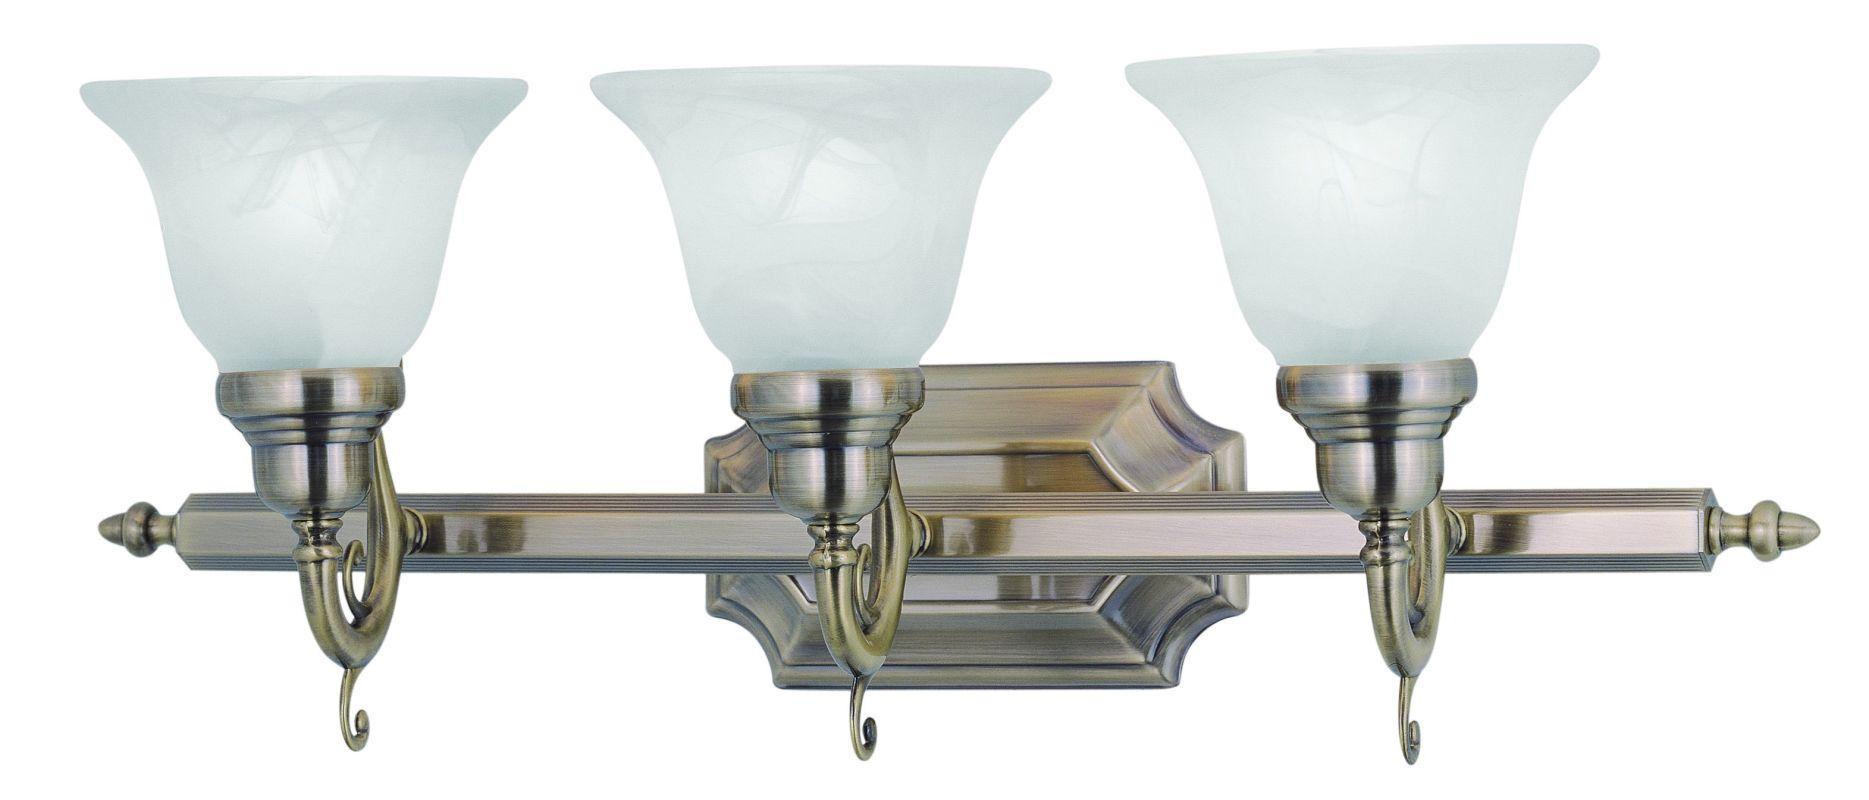 Livex Lighting 1283 French Regency 3 Light Bathroom Vanity Light Sale $215.91 ITEM: bci1791312 ID#:1283-01 UPC: 847284003408 :